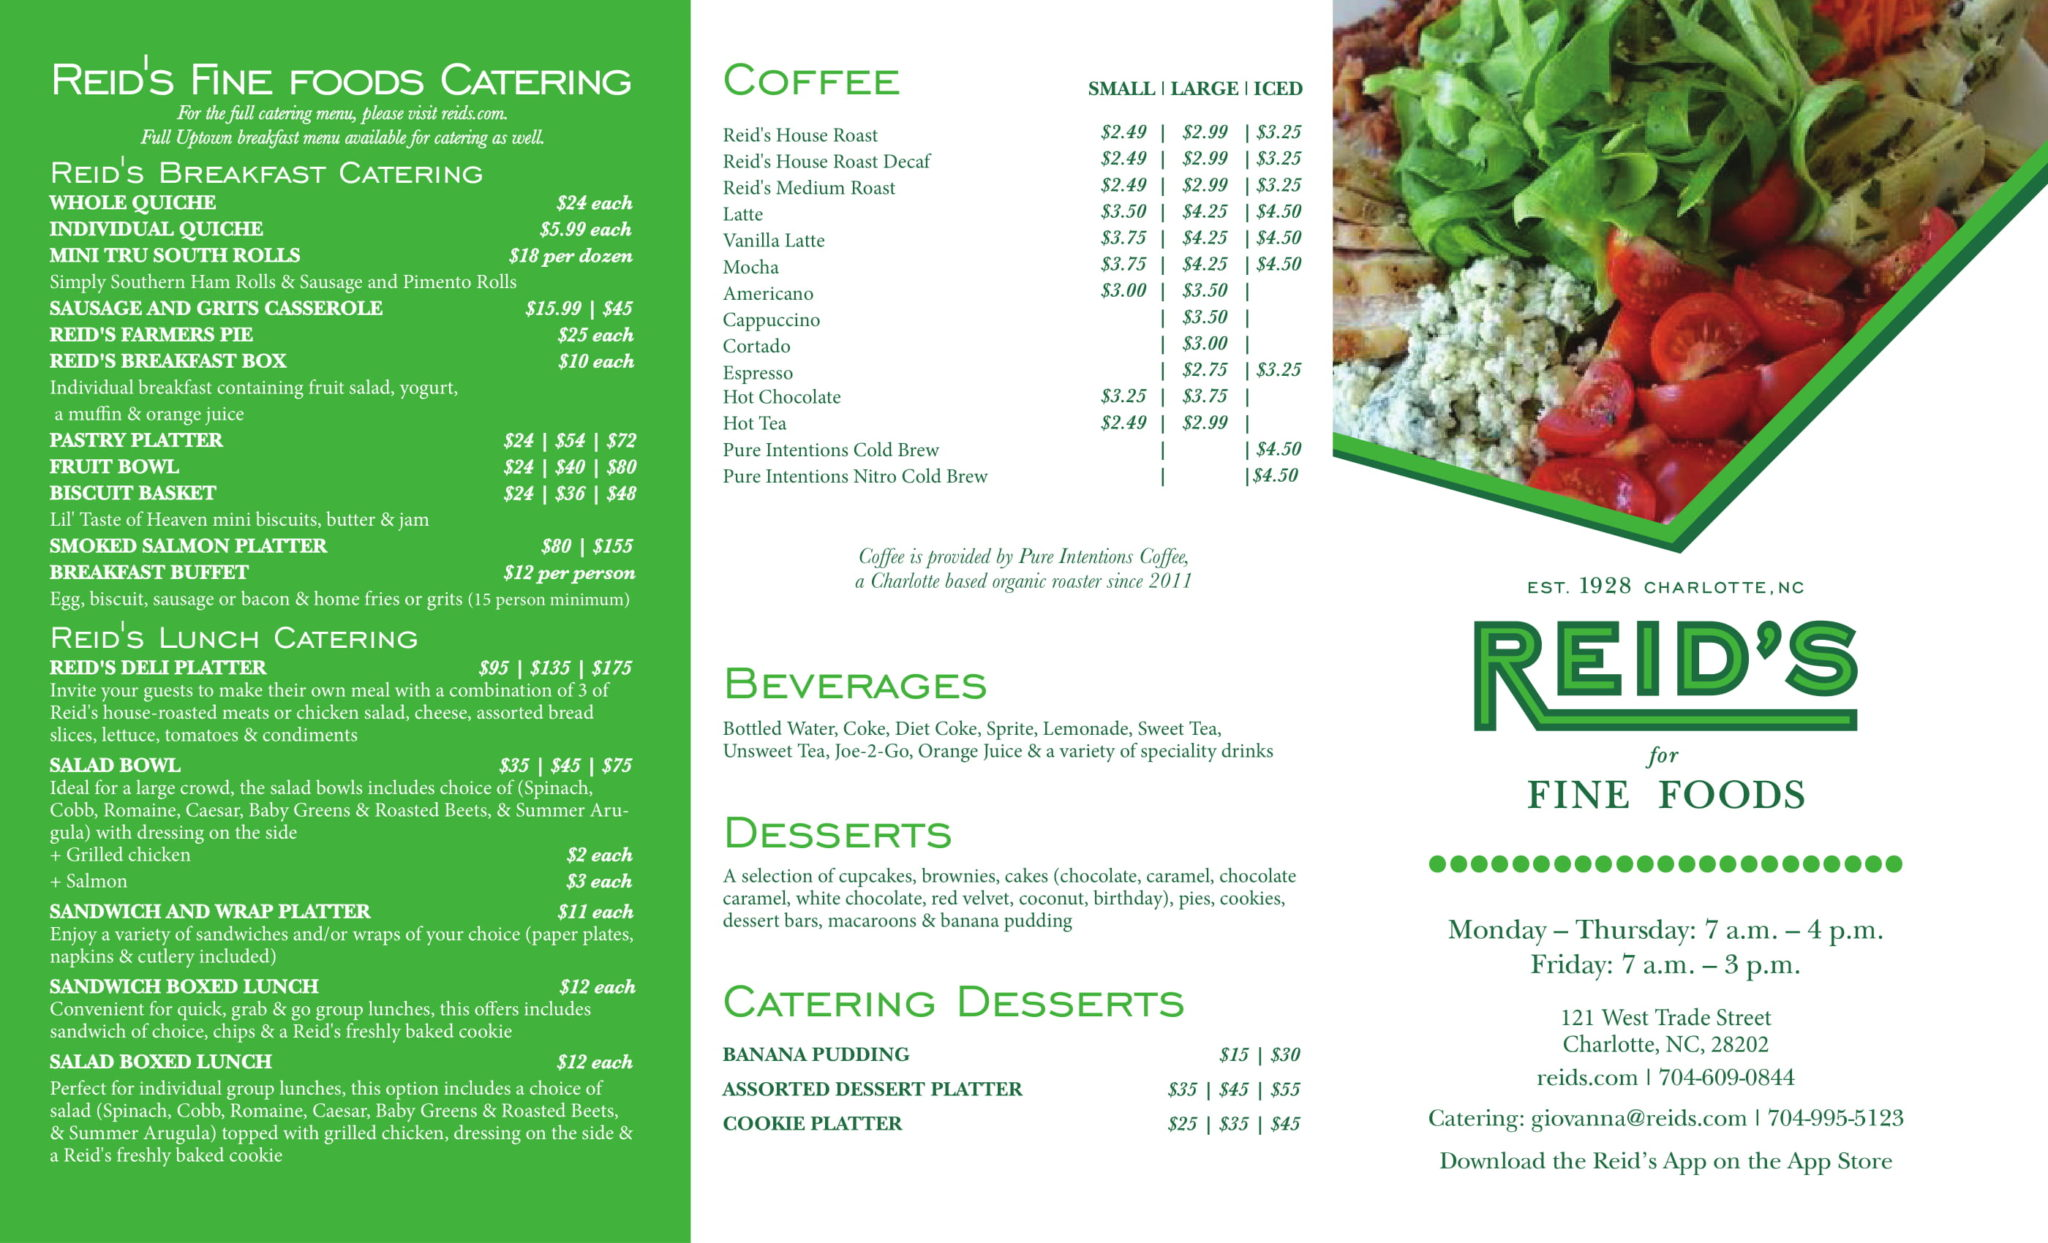 uptown menu